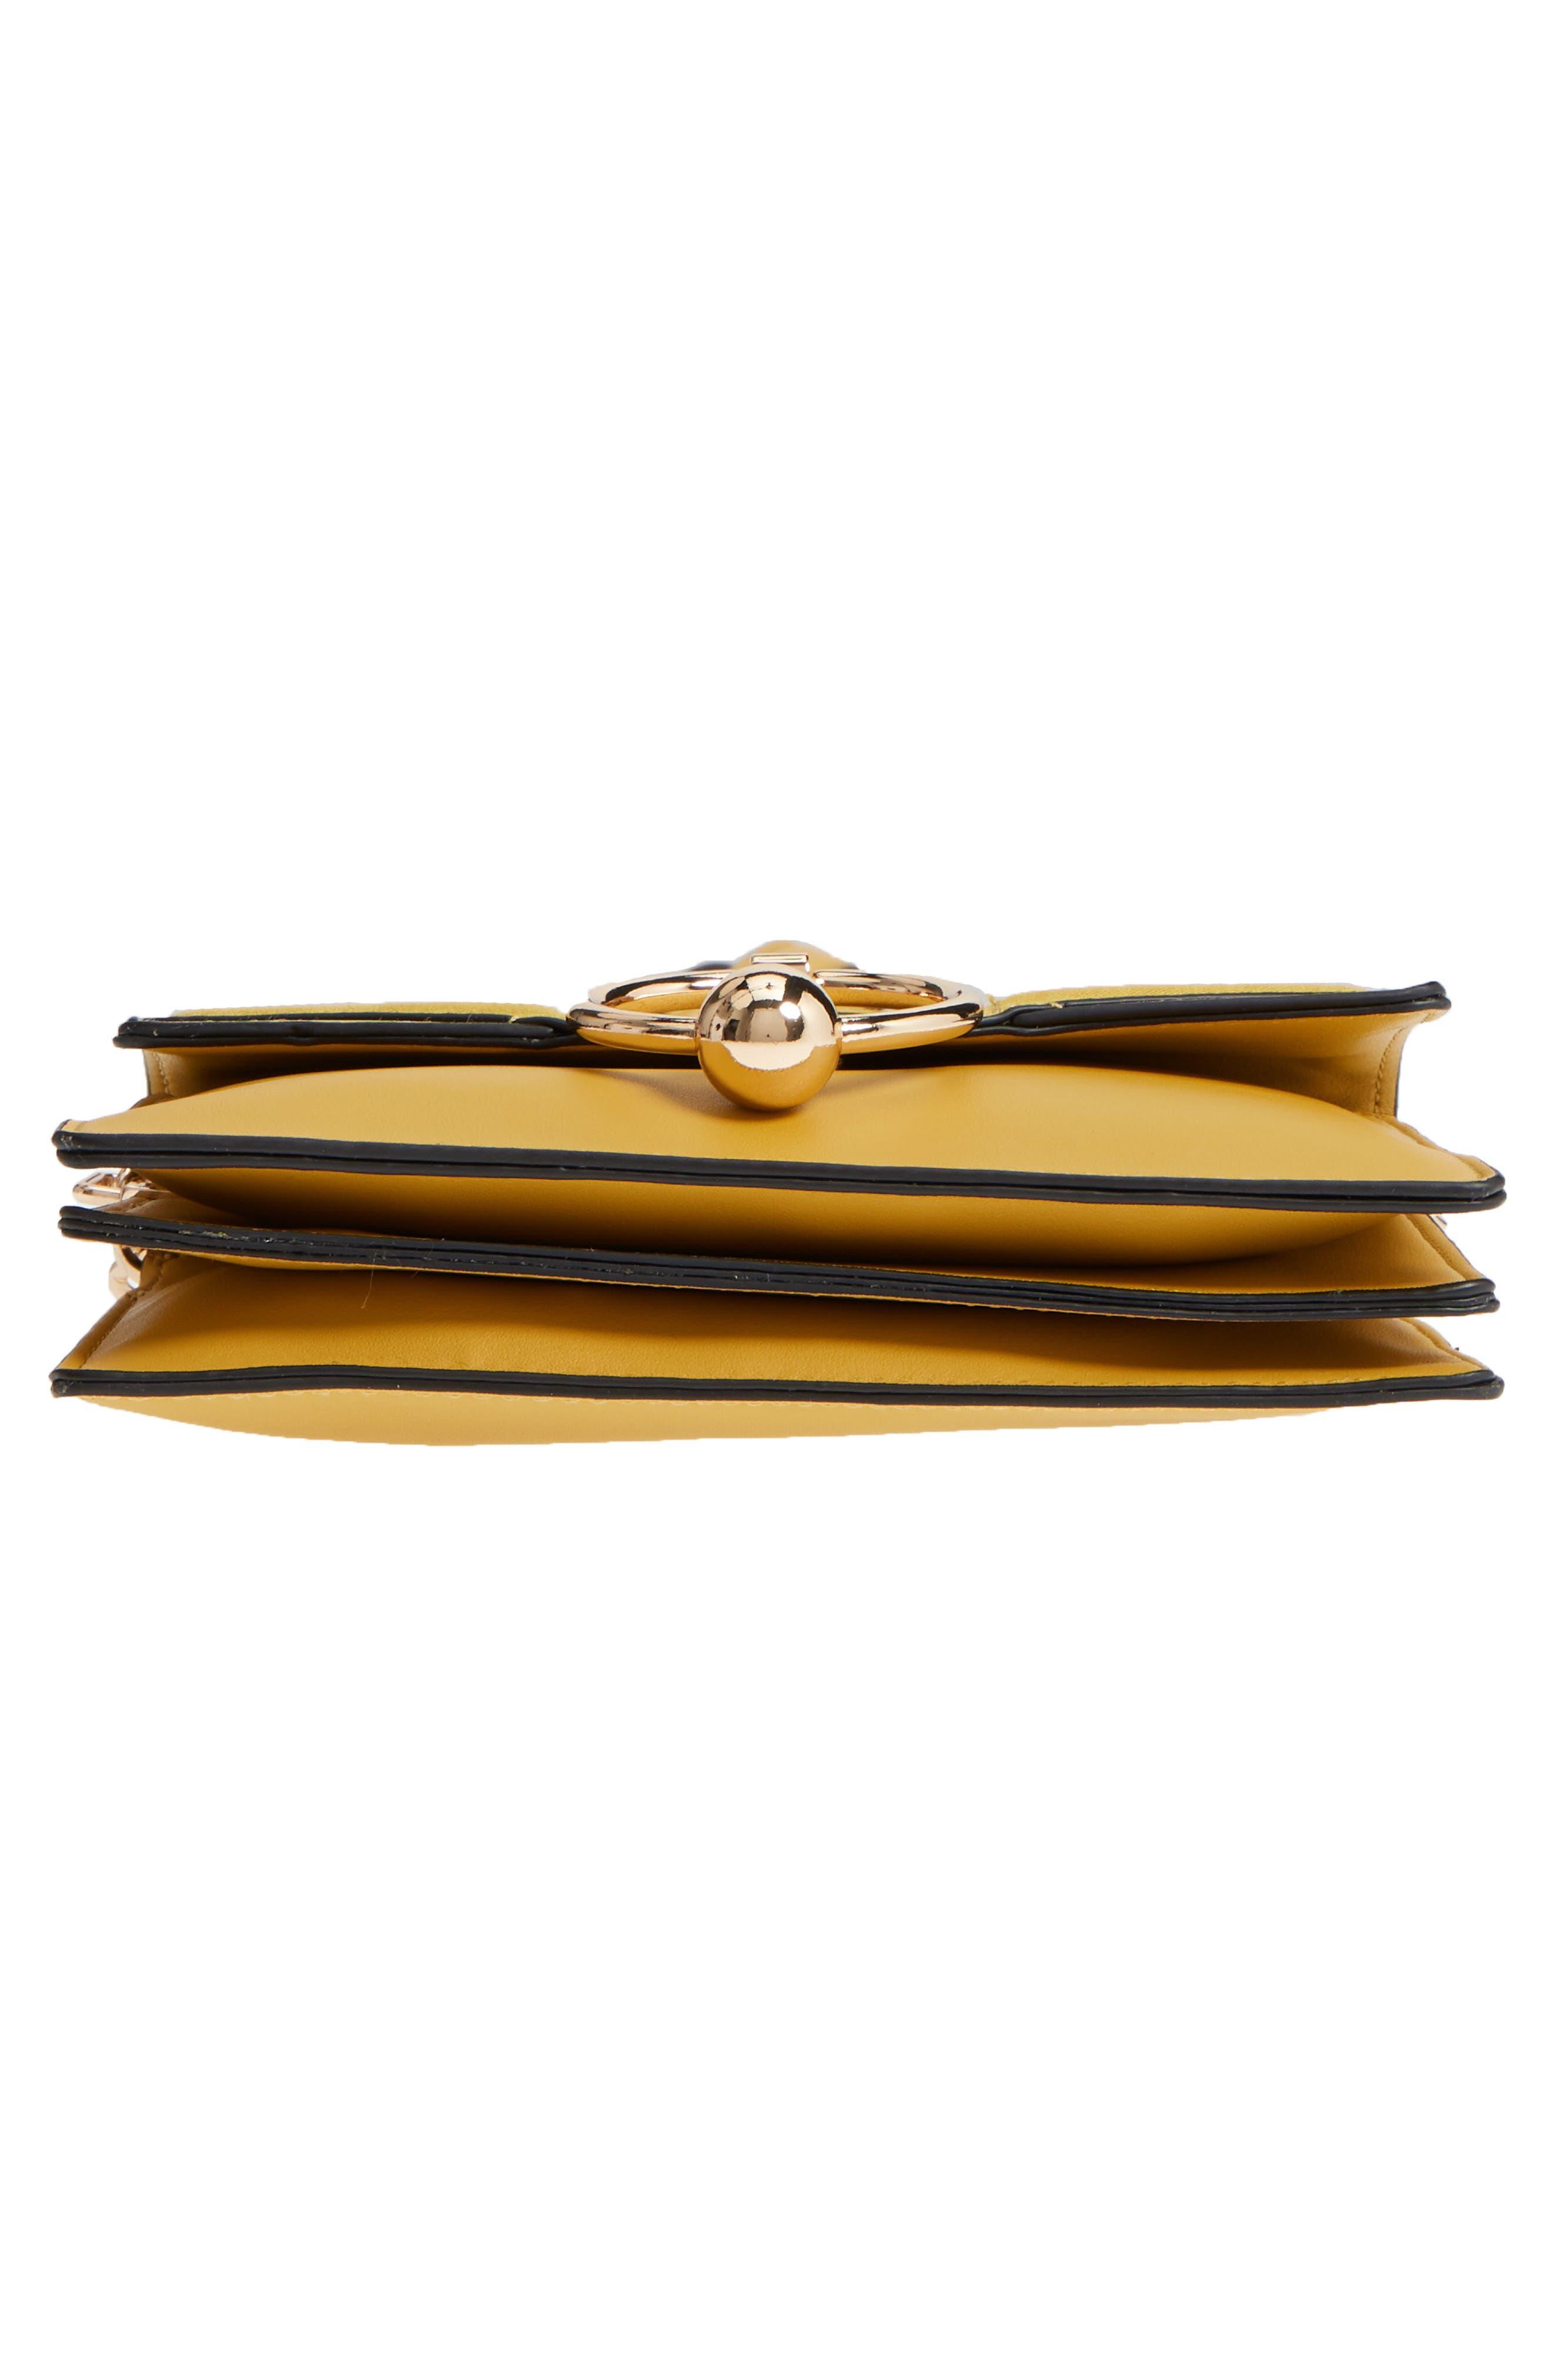 Seline Faux Leather Crossbody Bag,                             Alternate thumbnail 6, color,                             Yellow Multi